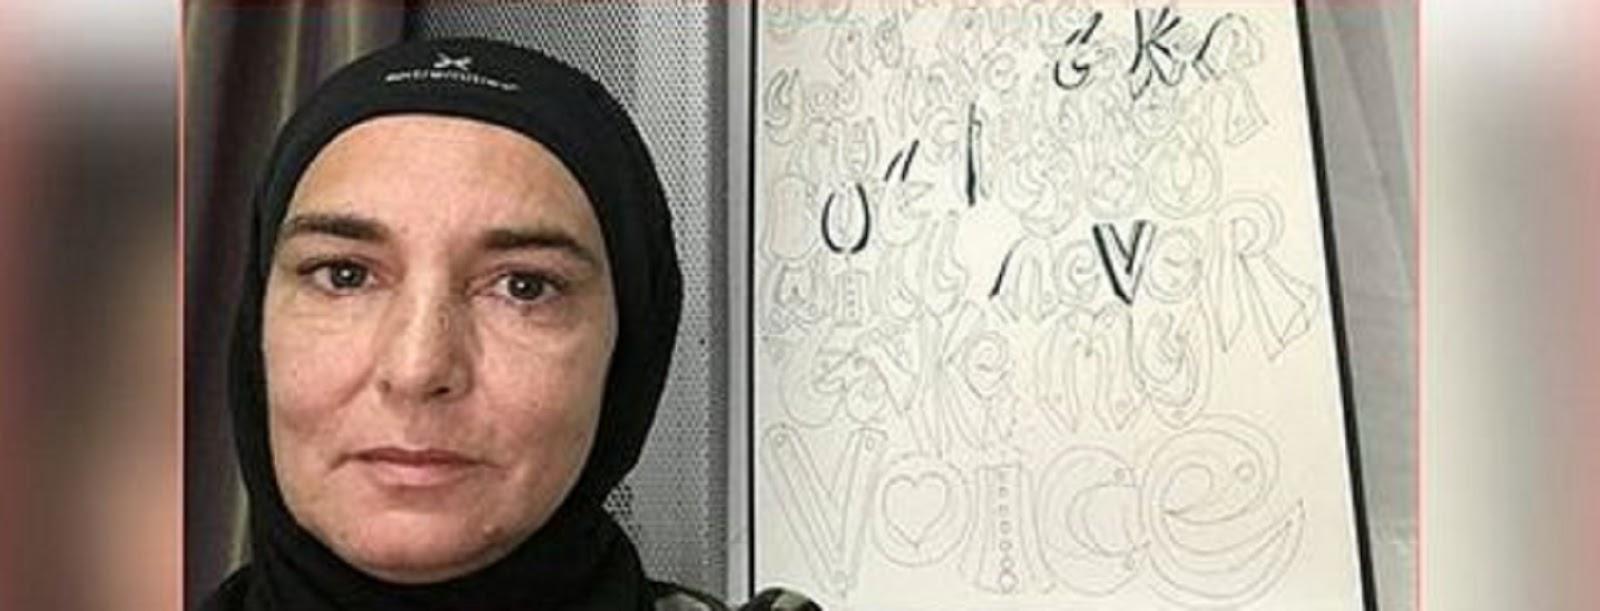 Subhanallah! Sinead O'Connor Masuk Islam, Kini Namanya Shuhada Davitt